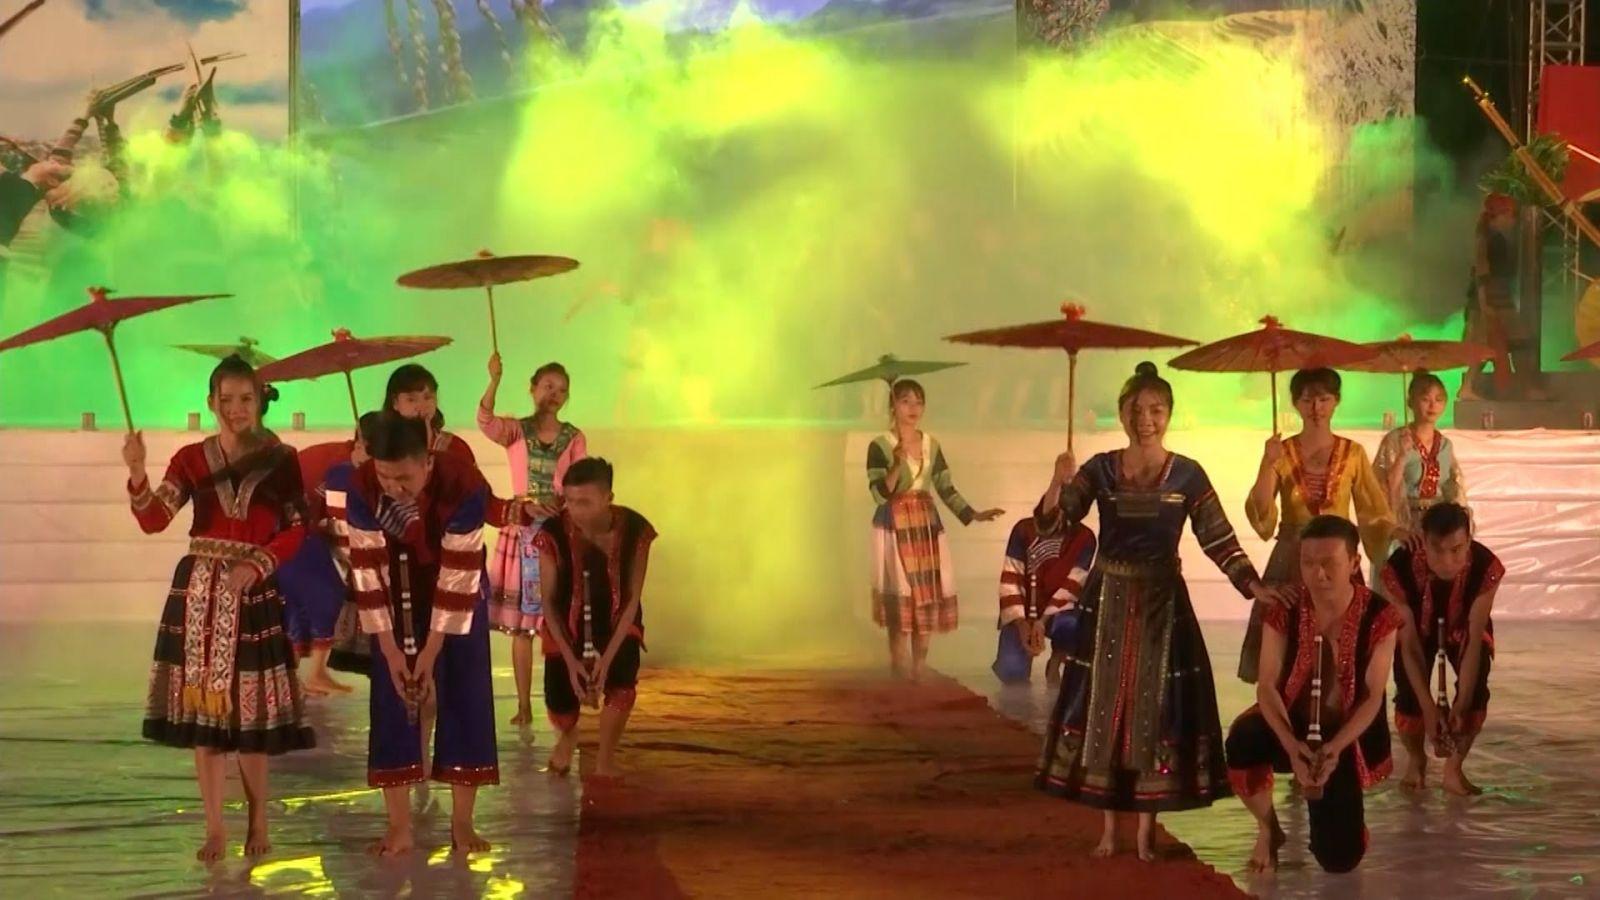 le-hoi-ruong-bac-thang-mu-cang-chai-2018-vietmountain-travel2